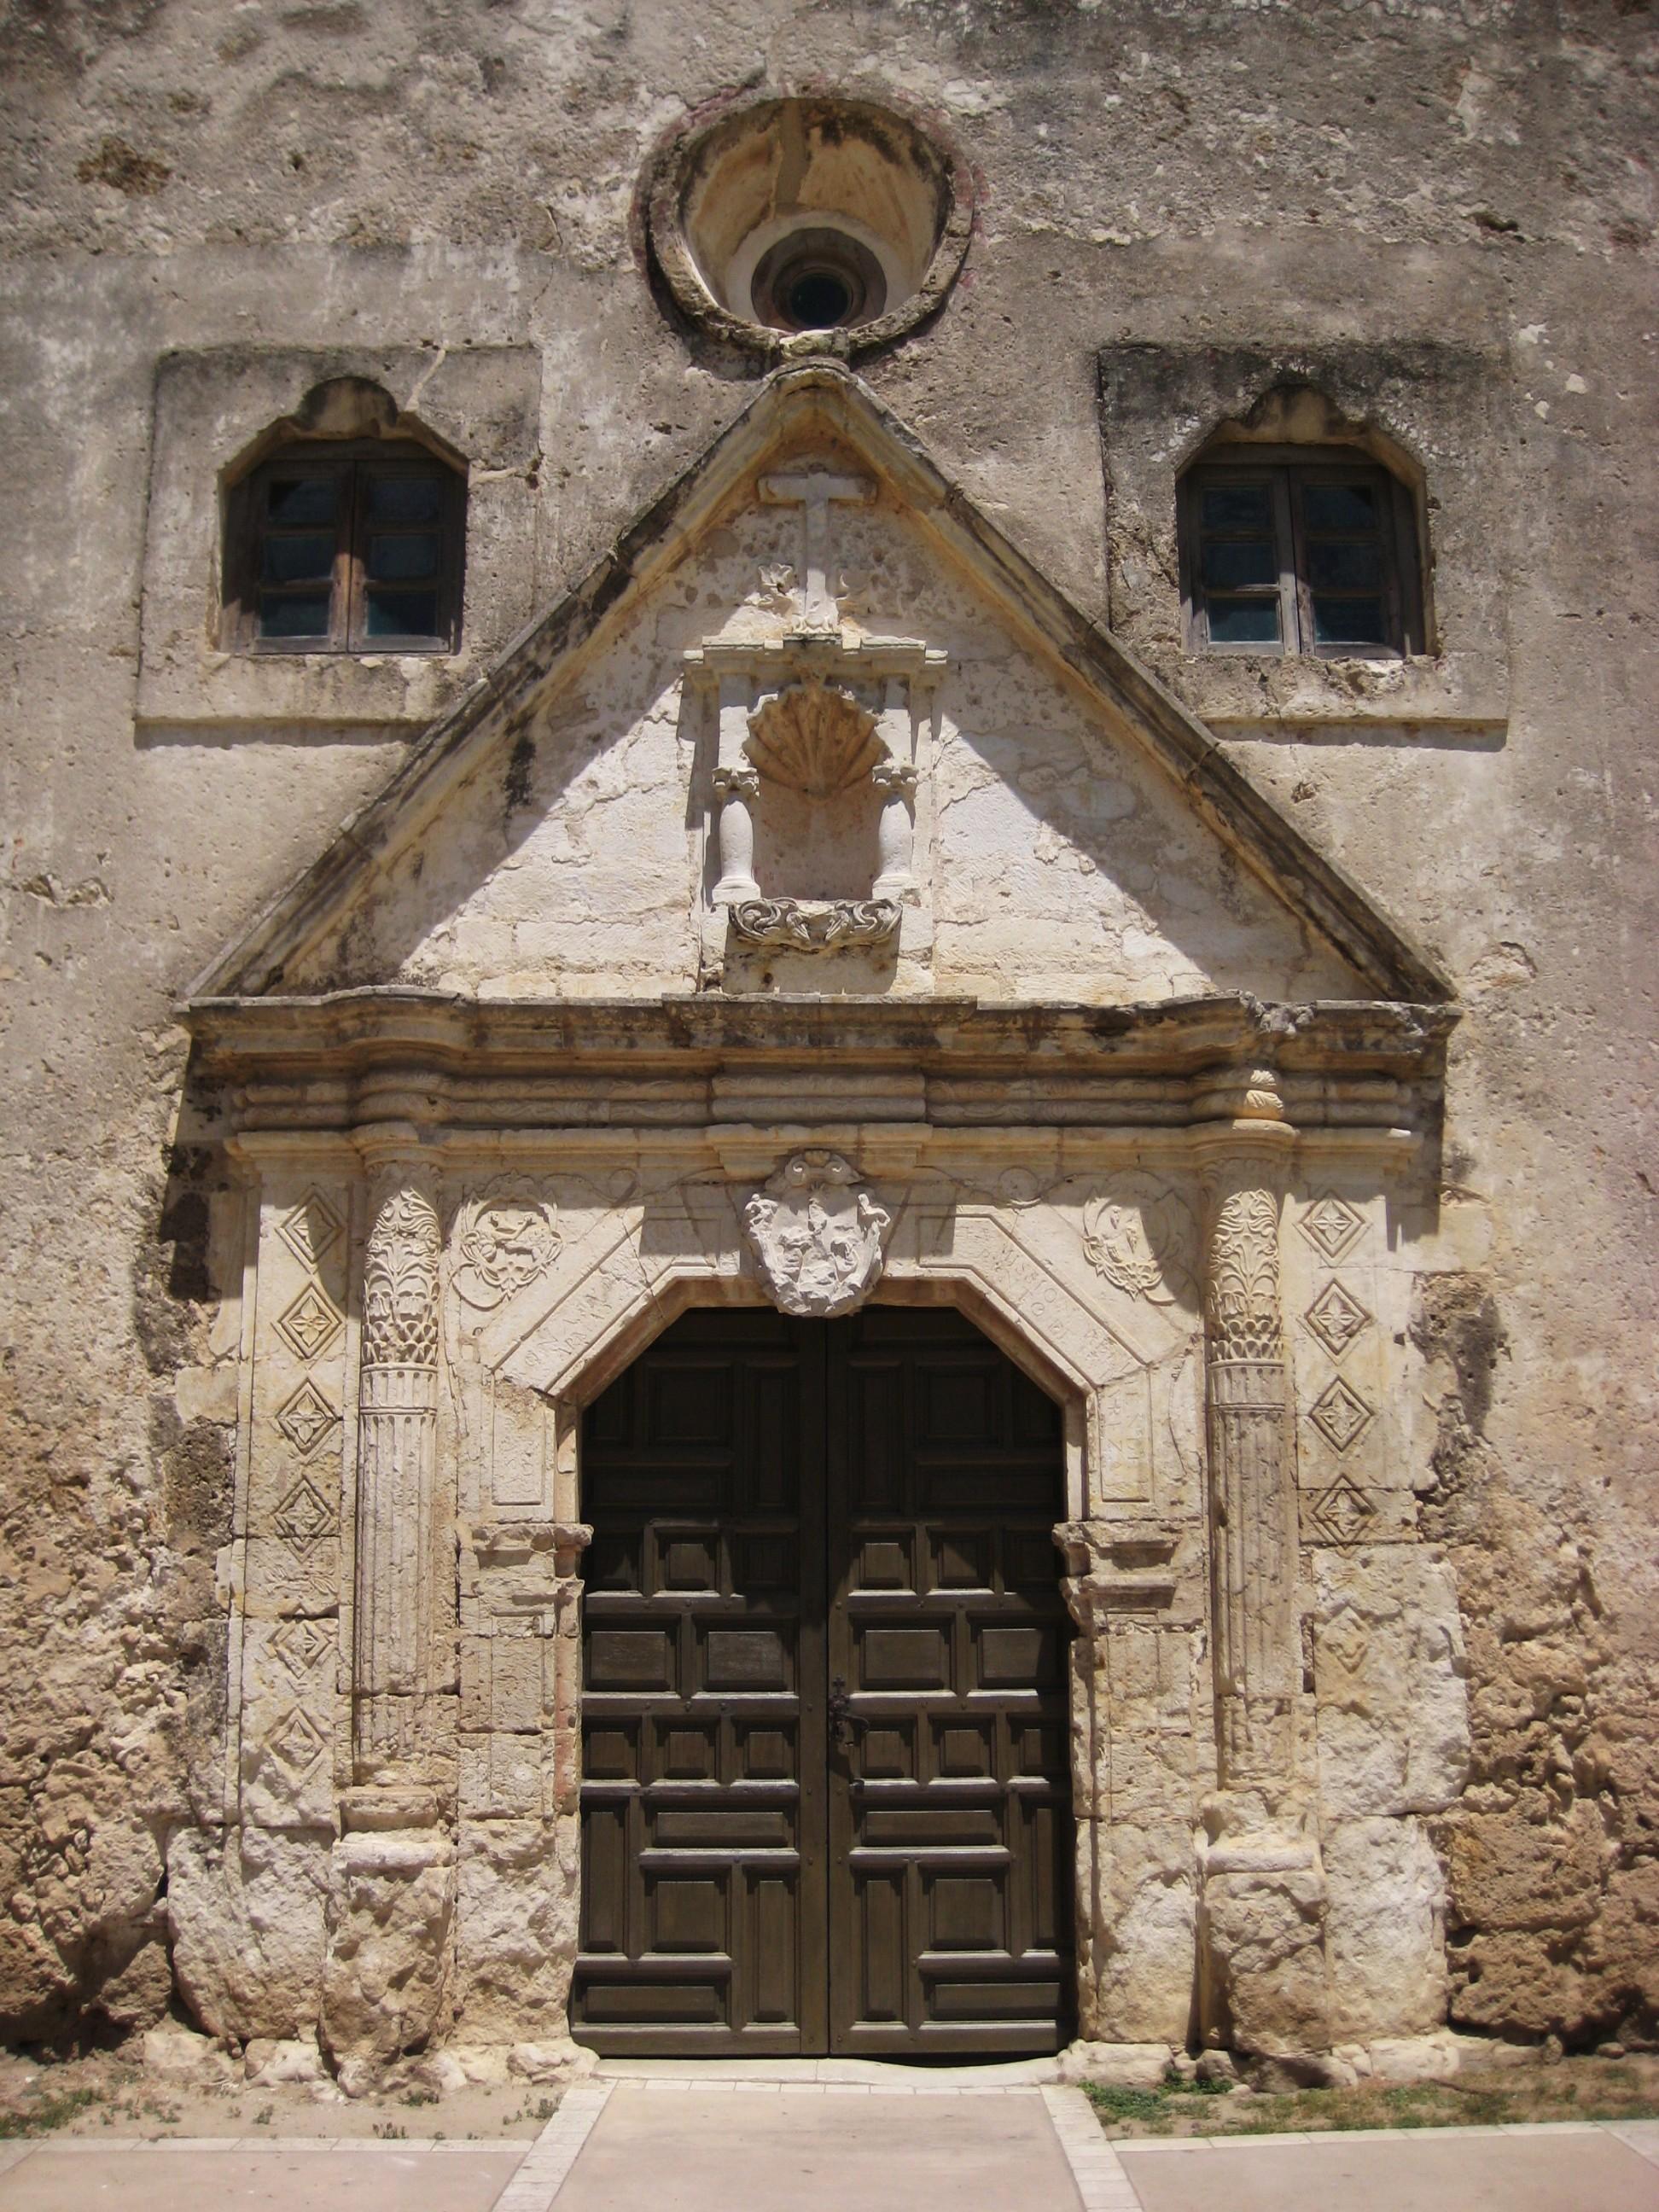 FileMission Concepcion San Antonio Door.JPG & File:Mission Concepcion San Antonio Door.JPG - Wikimedia Commons